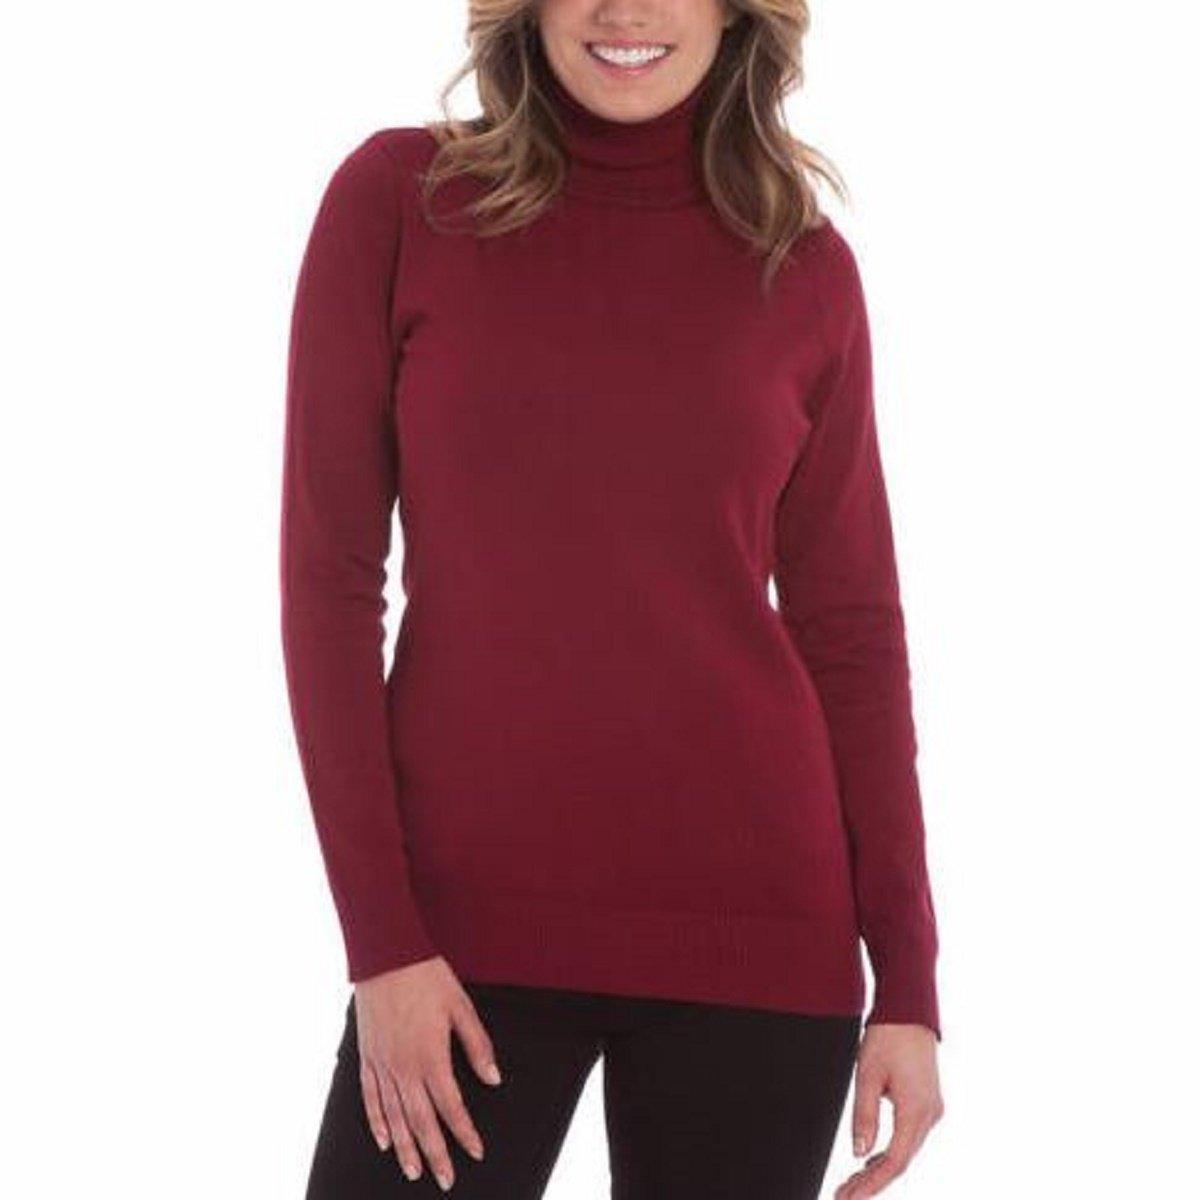 5c8ea4ffbc Joseph A. Women s Solid Long Sleeve Turtleneck Sweater at Amazon Women s  Clothing store